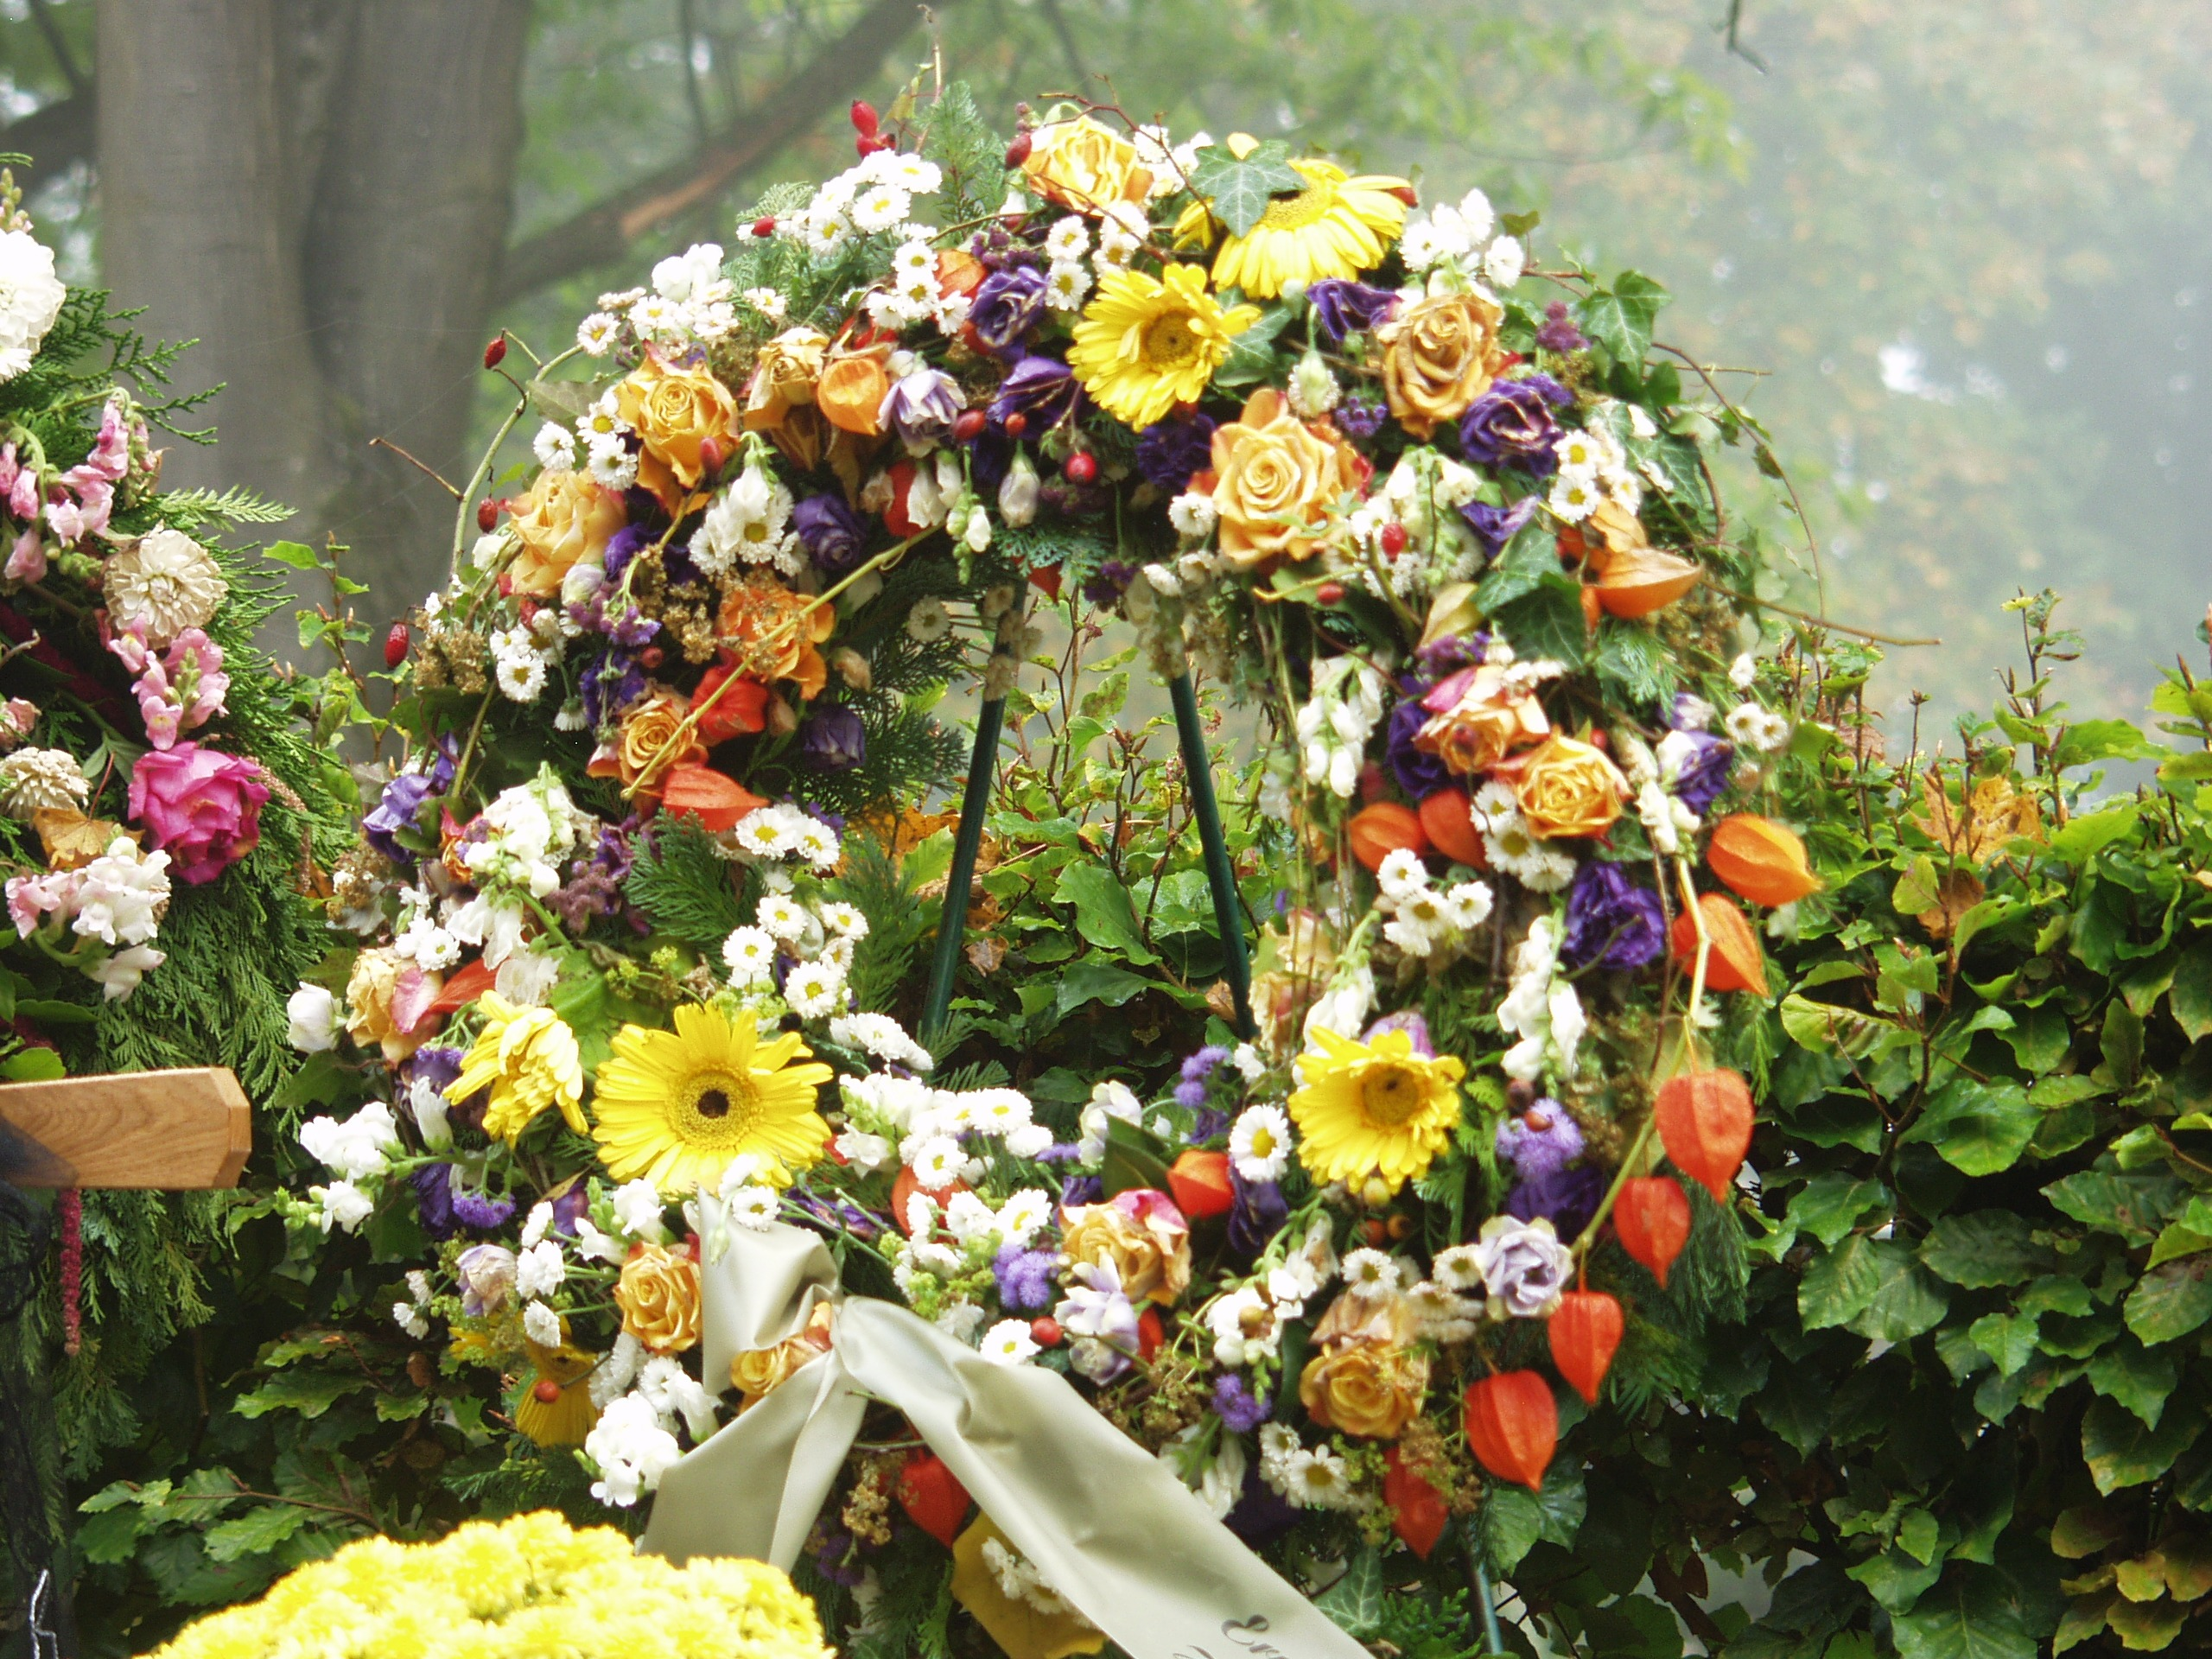 A floral wreath